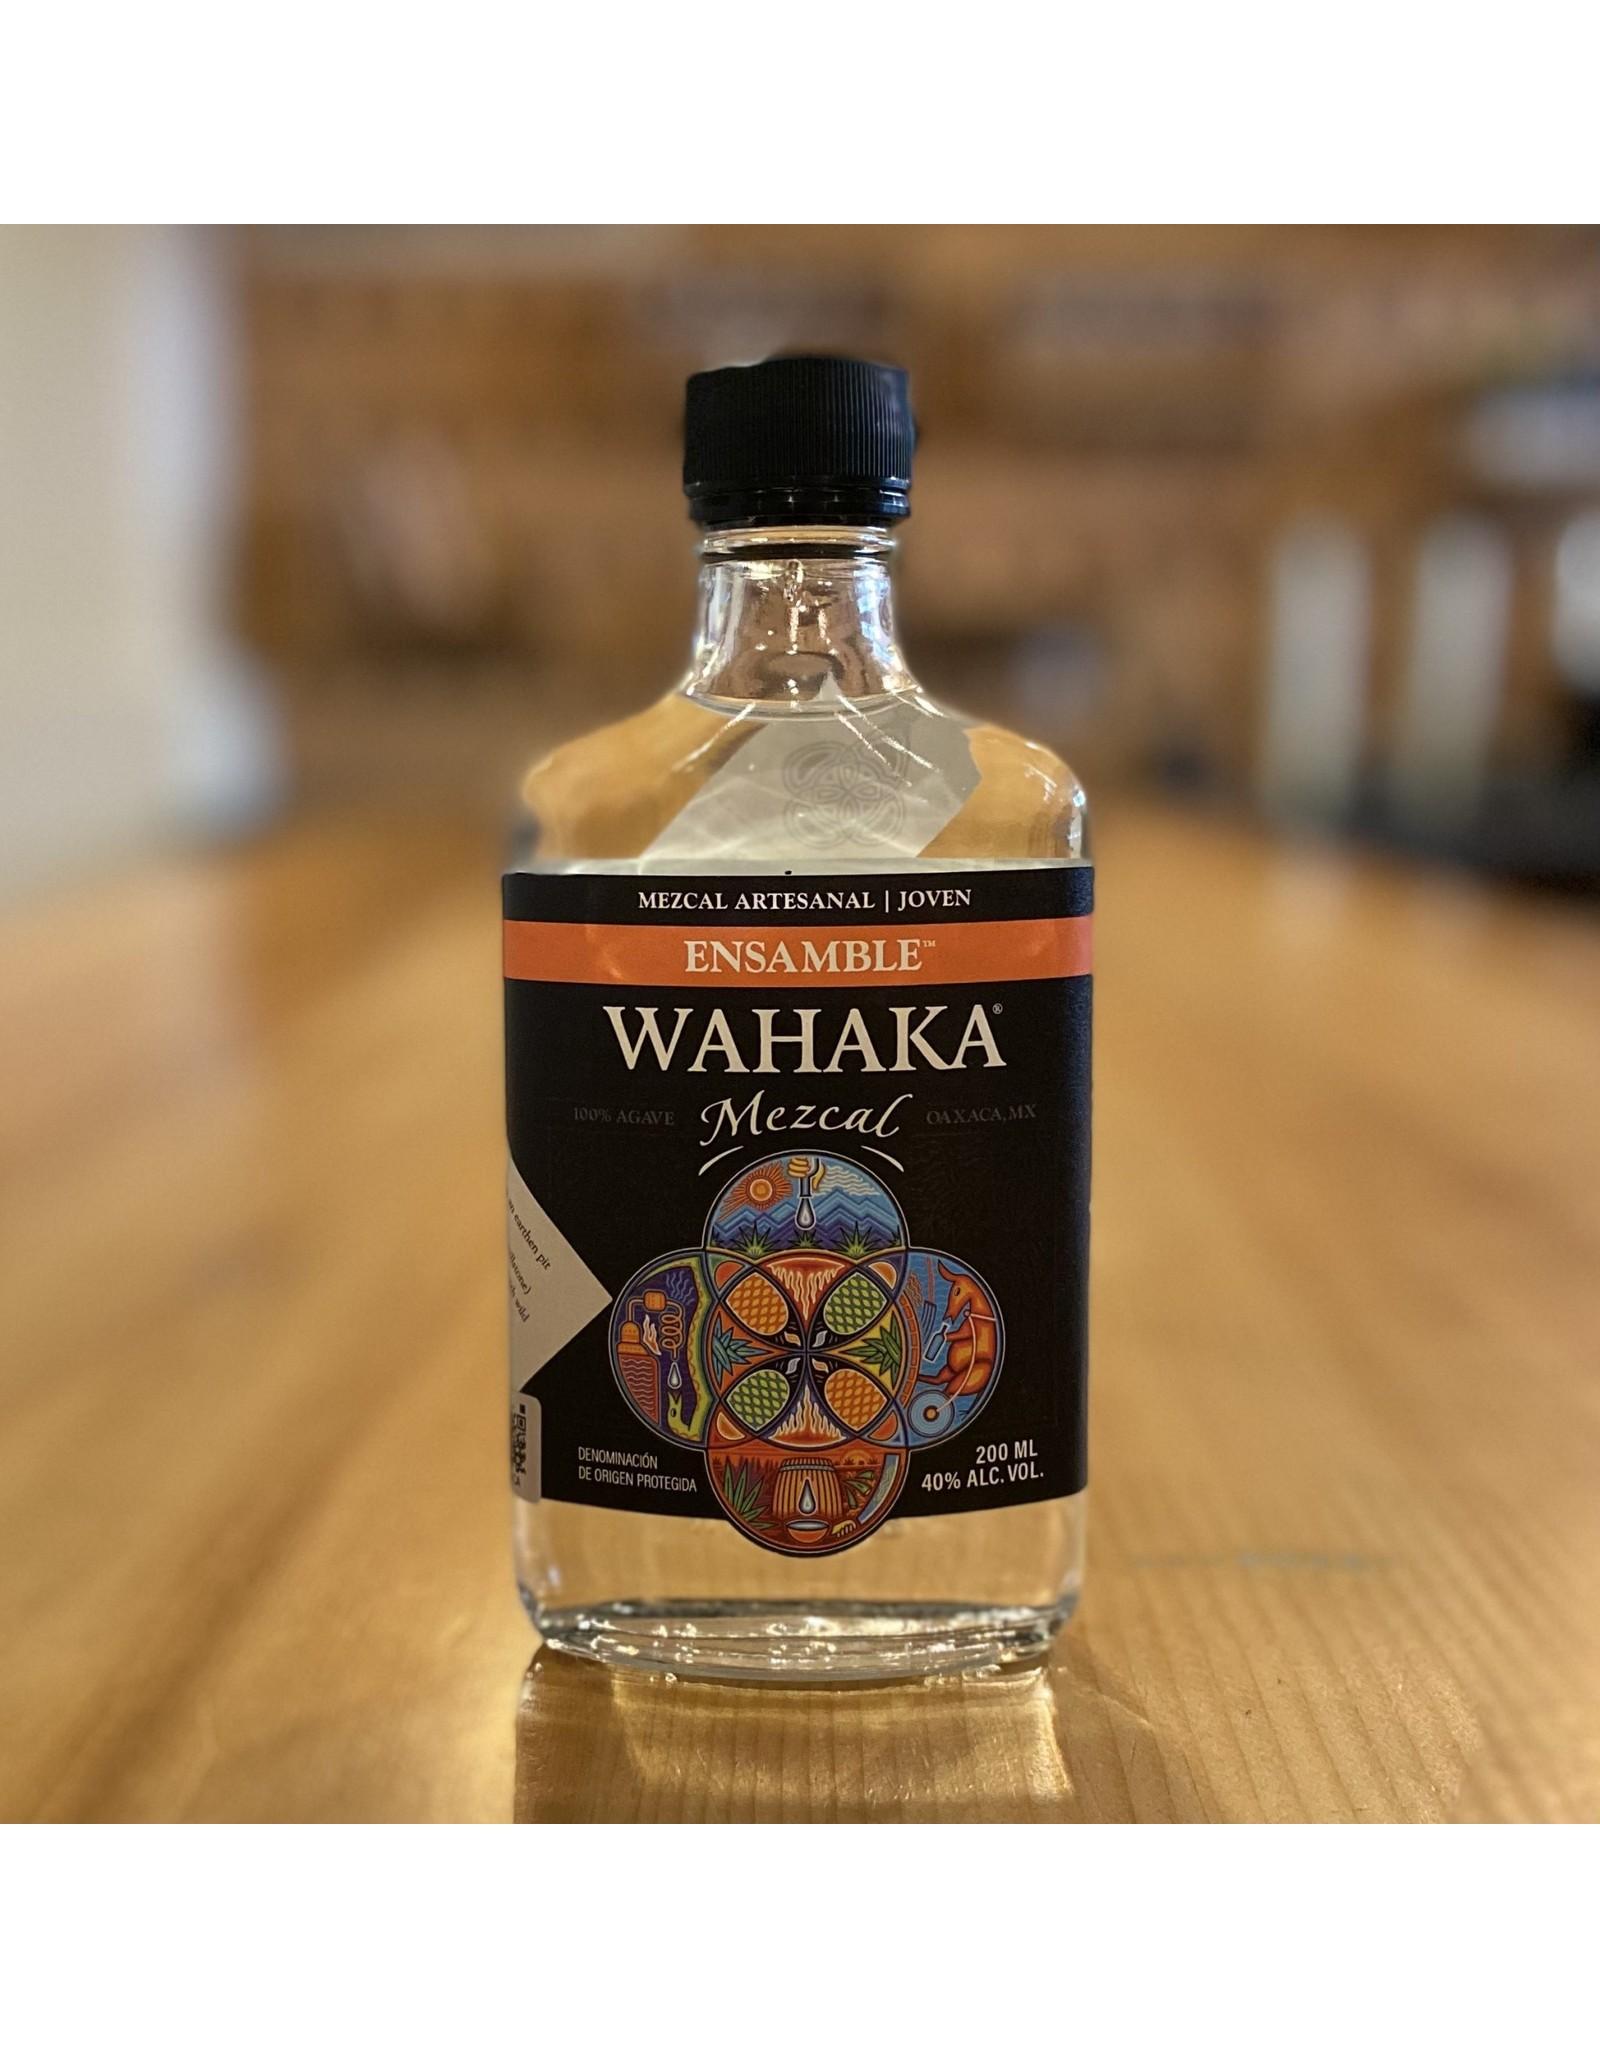 "Wahaka ""Ensamble"" Joven Mezcal w/Espadin, Madre-Cuishe and Tobala Agave 200ml - Oaxaca, Mexico"